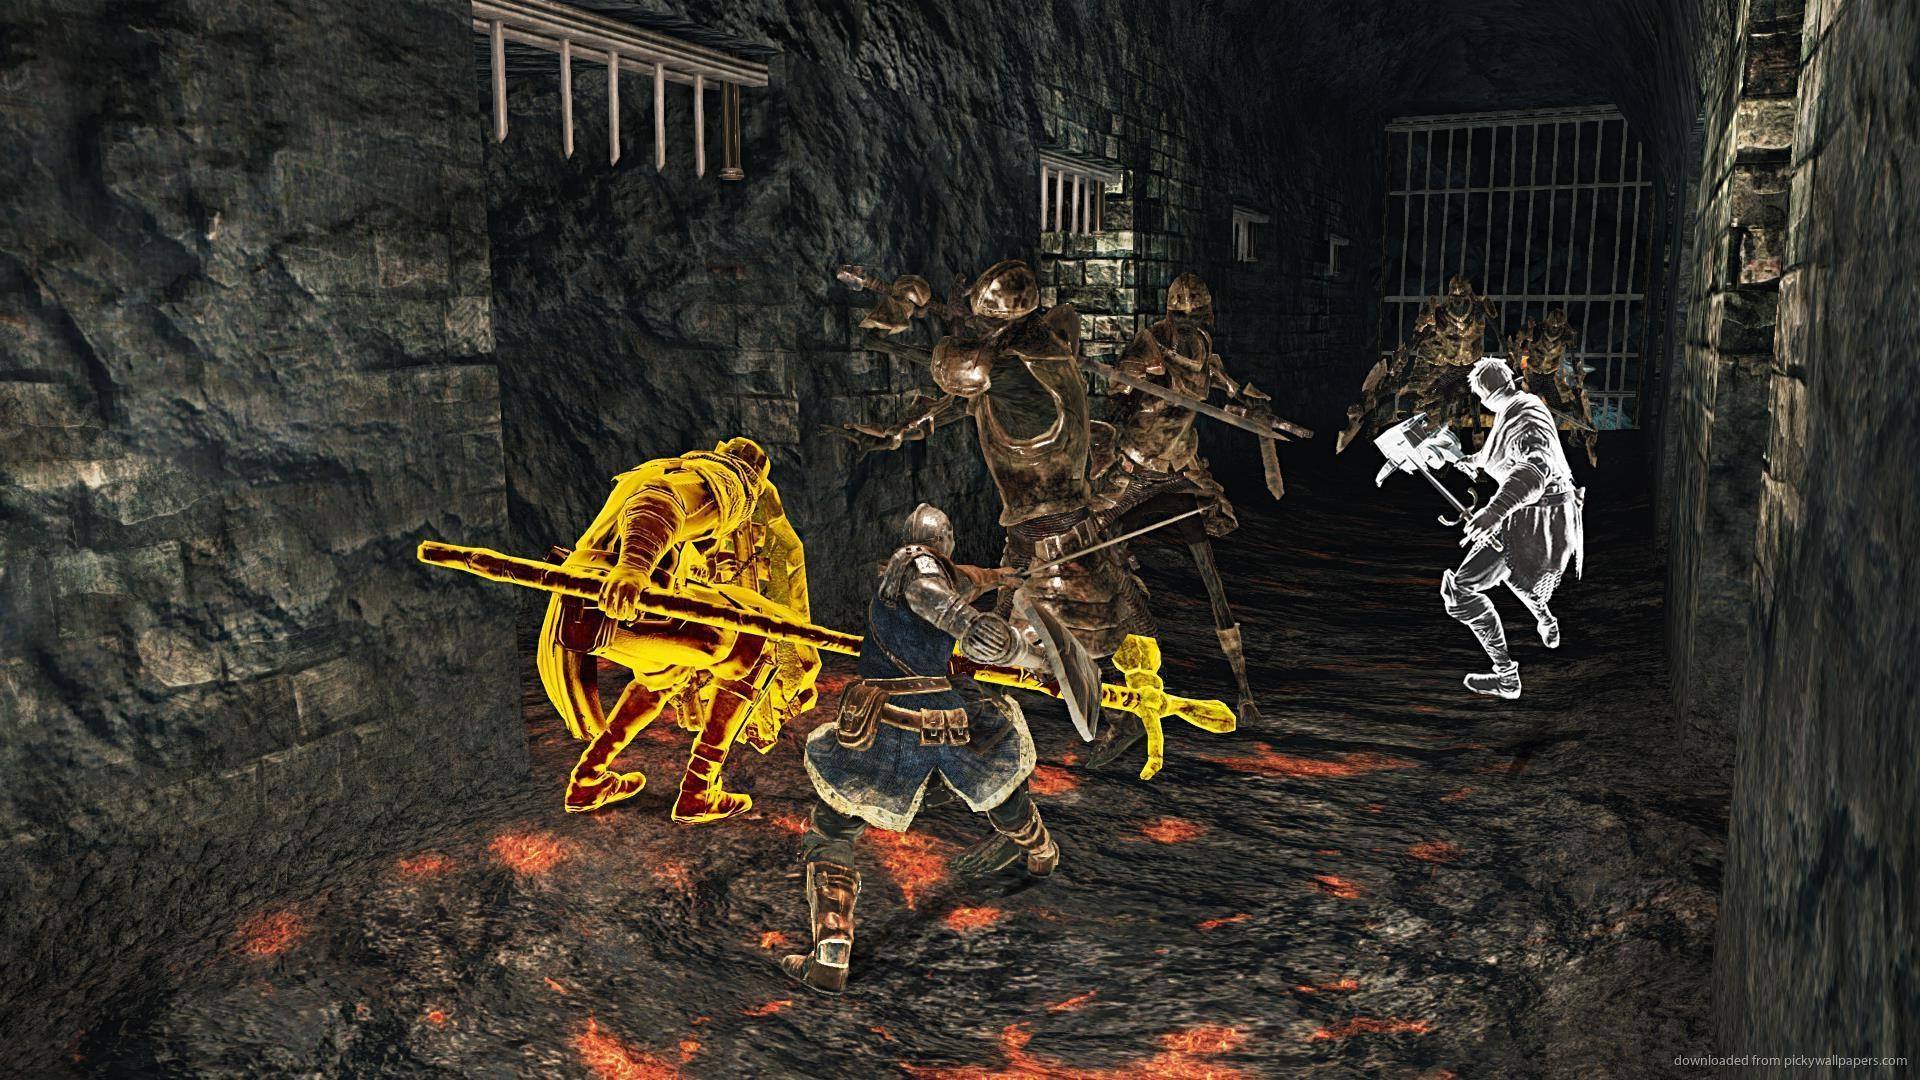 2014 Dark Souls 2 Video Game Desktop Wallpaper picture